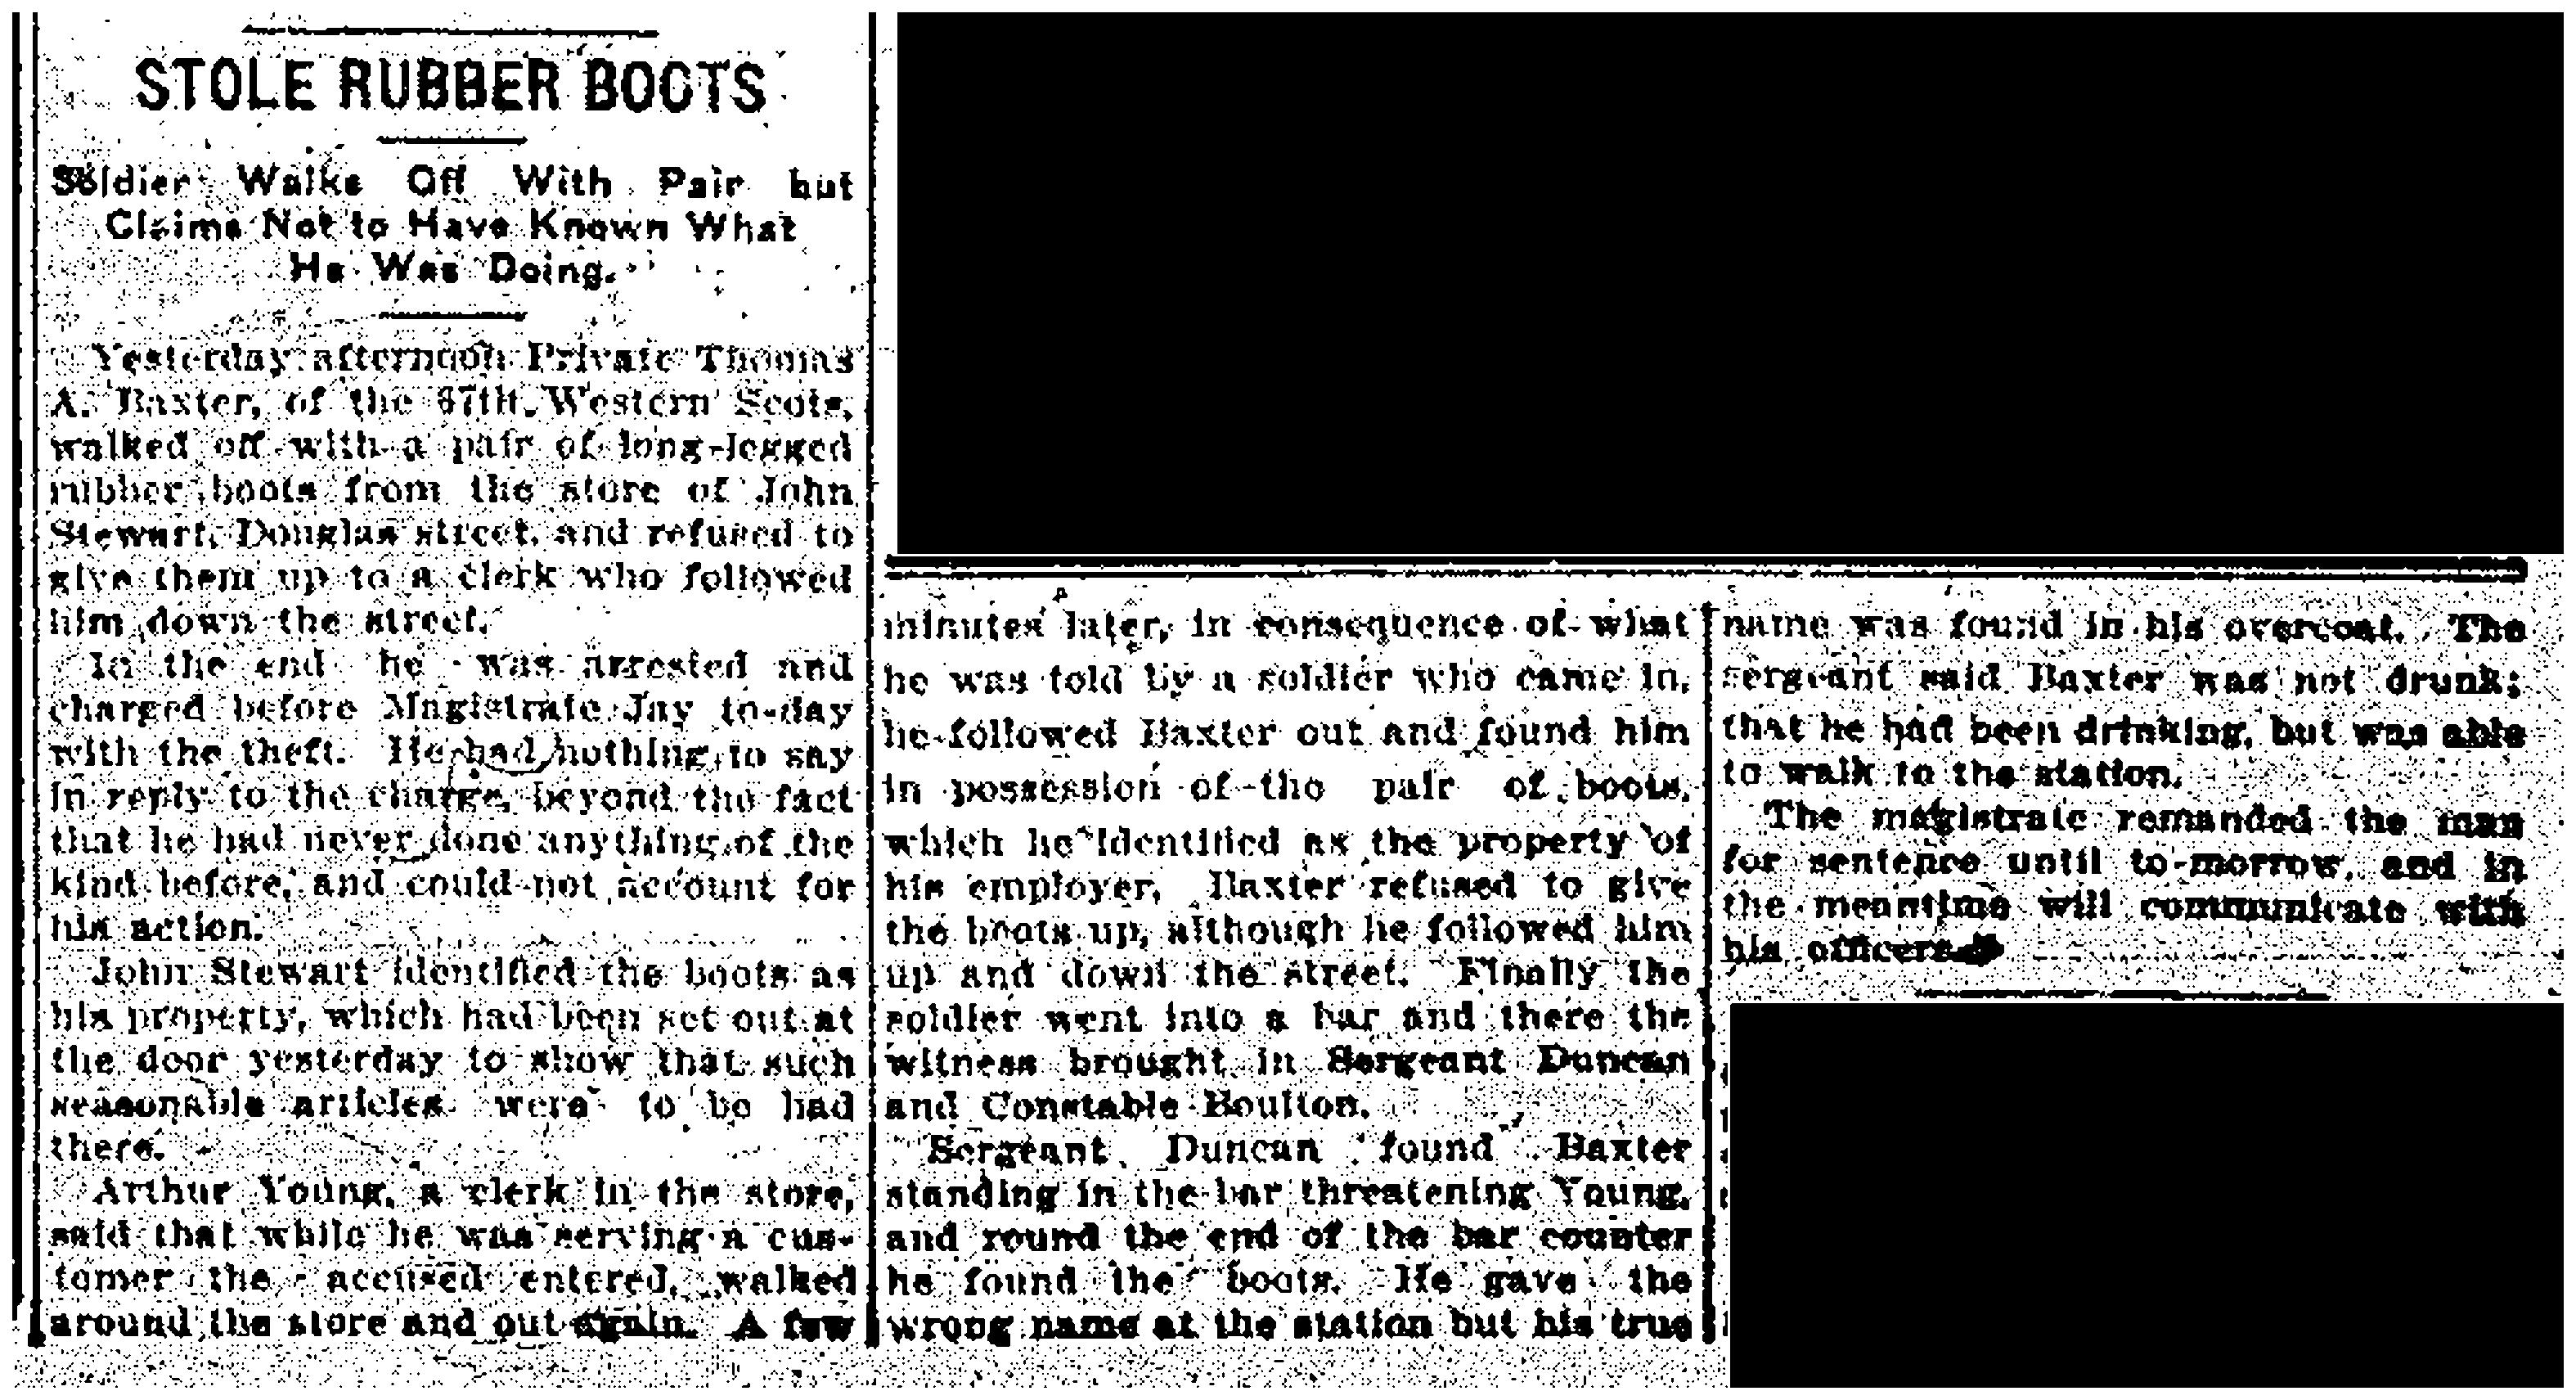 Soldier Steals Boots